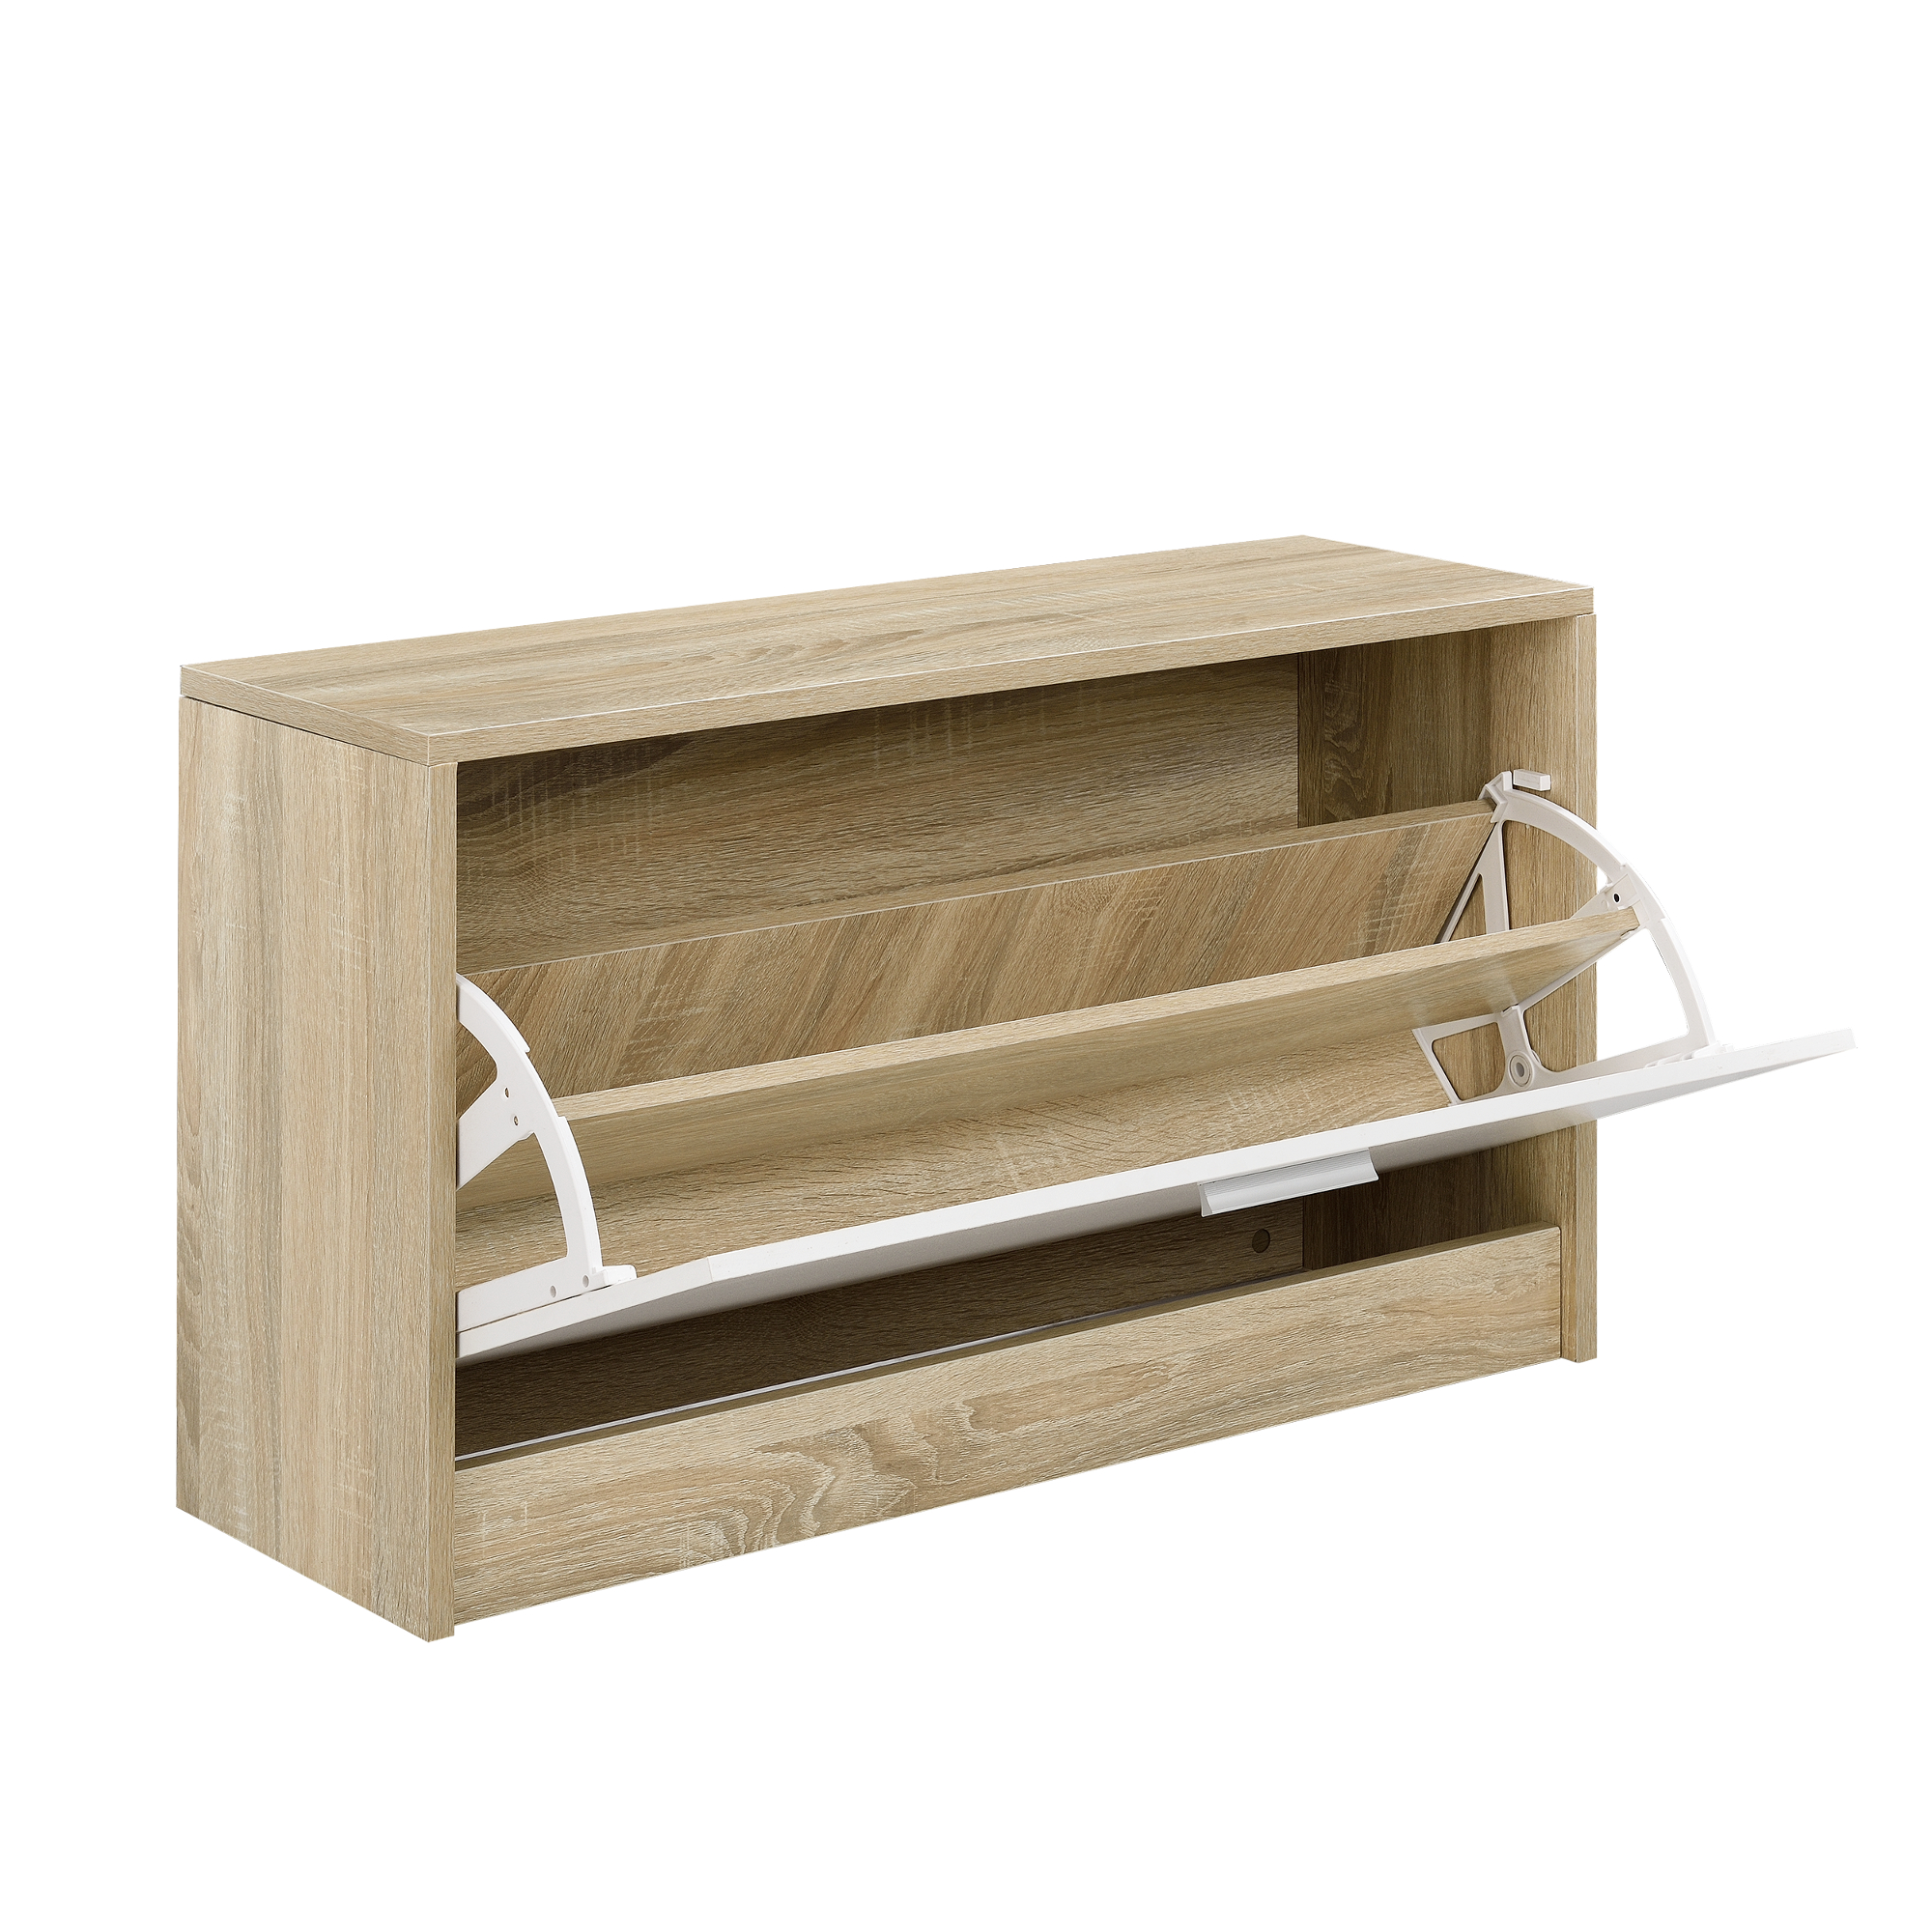 Garderobenset Garderobe Schuhschrank Spiegel Paneel Schuhkipper Set